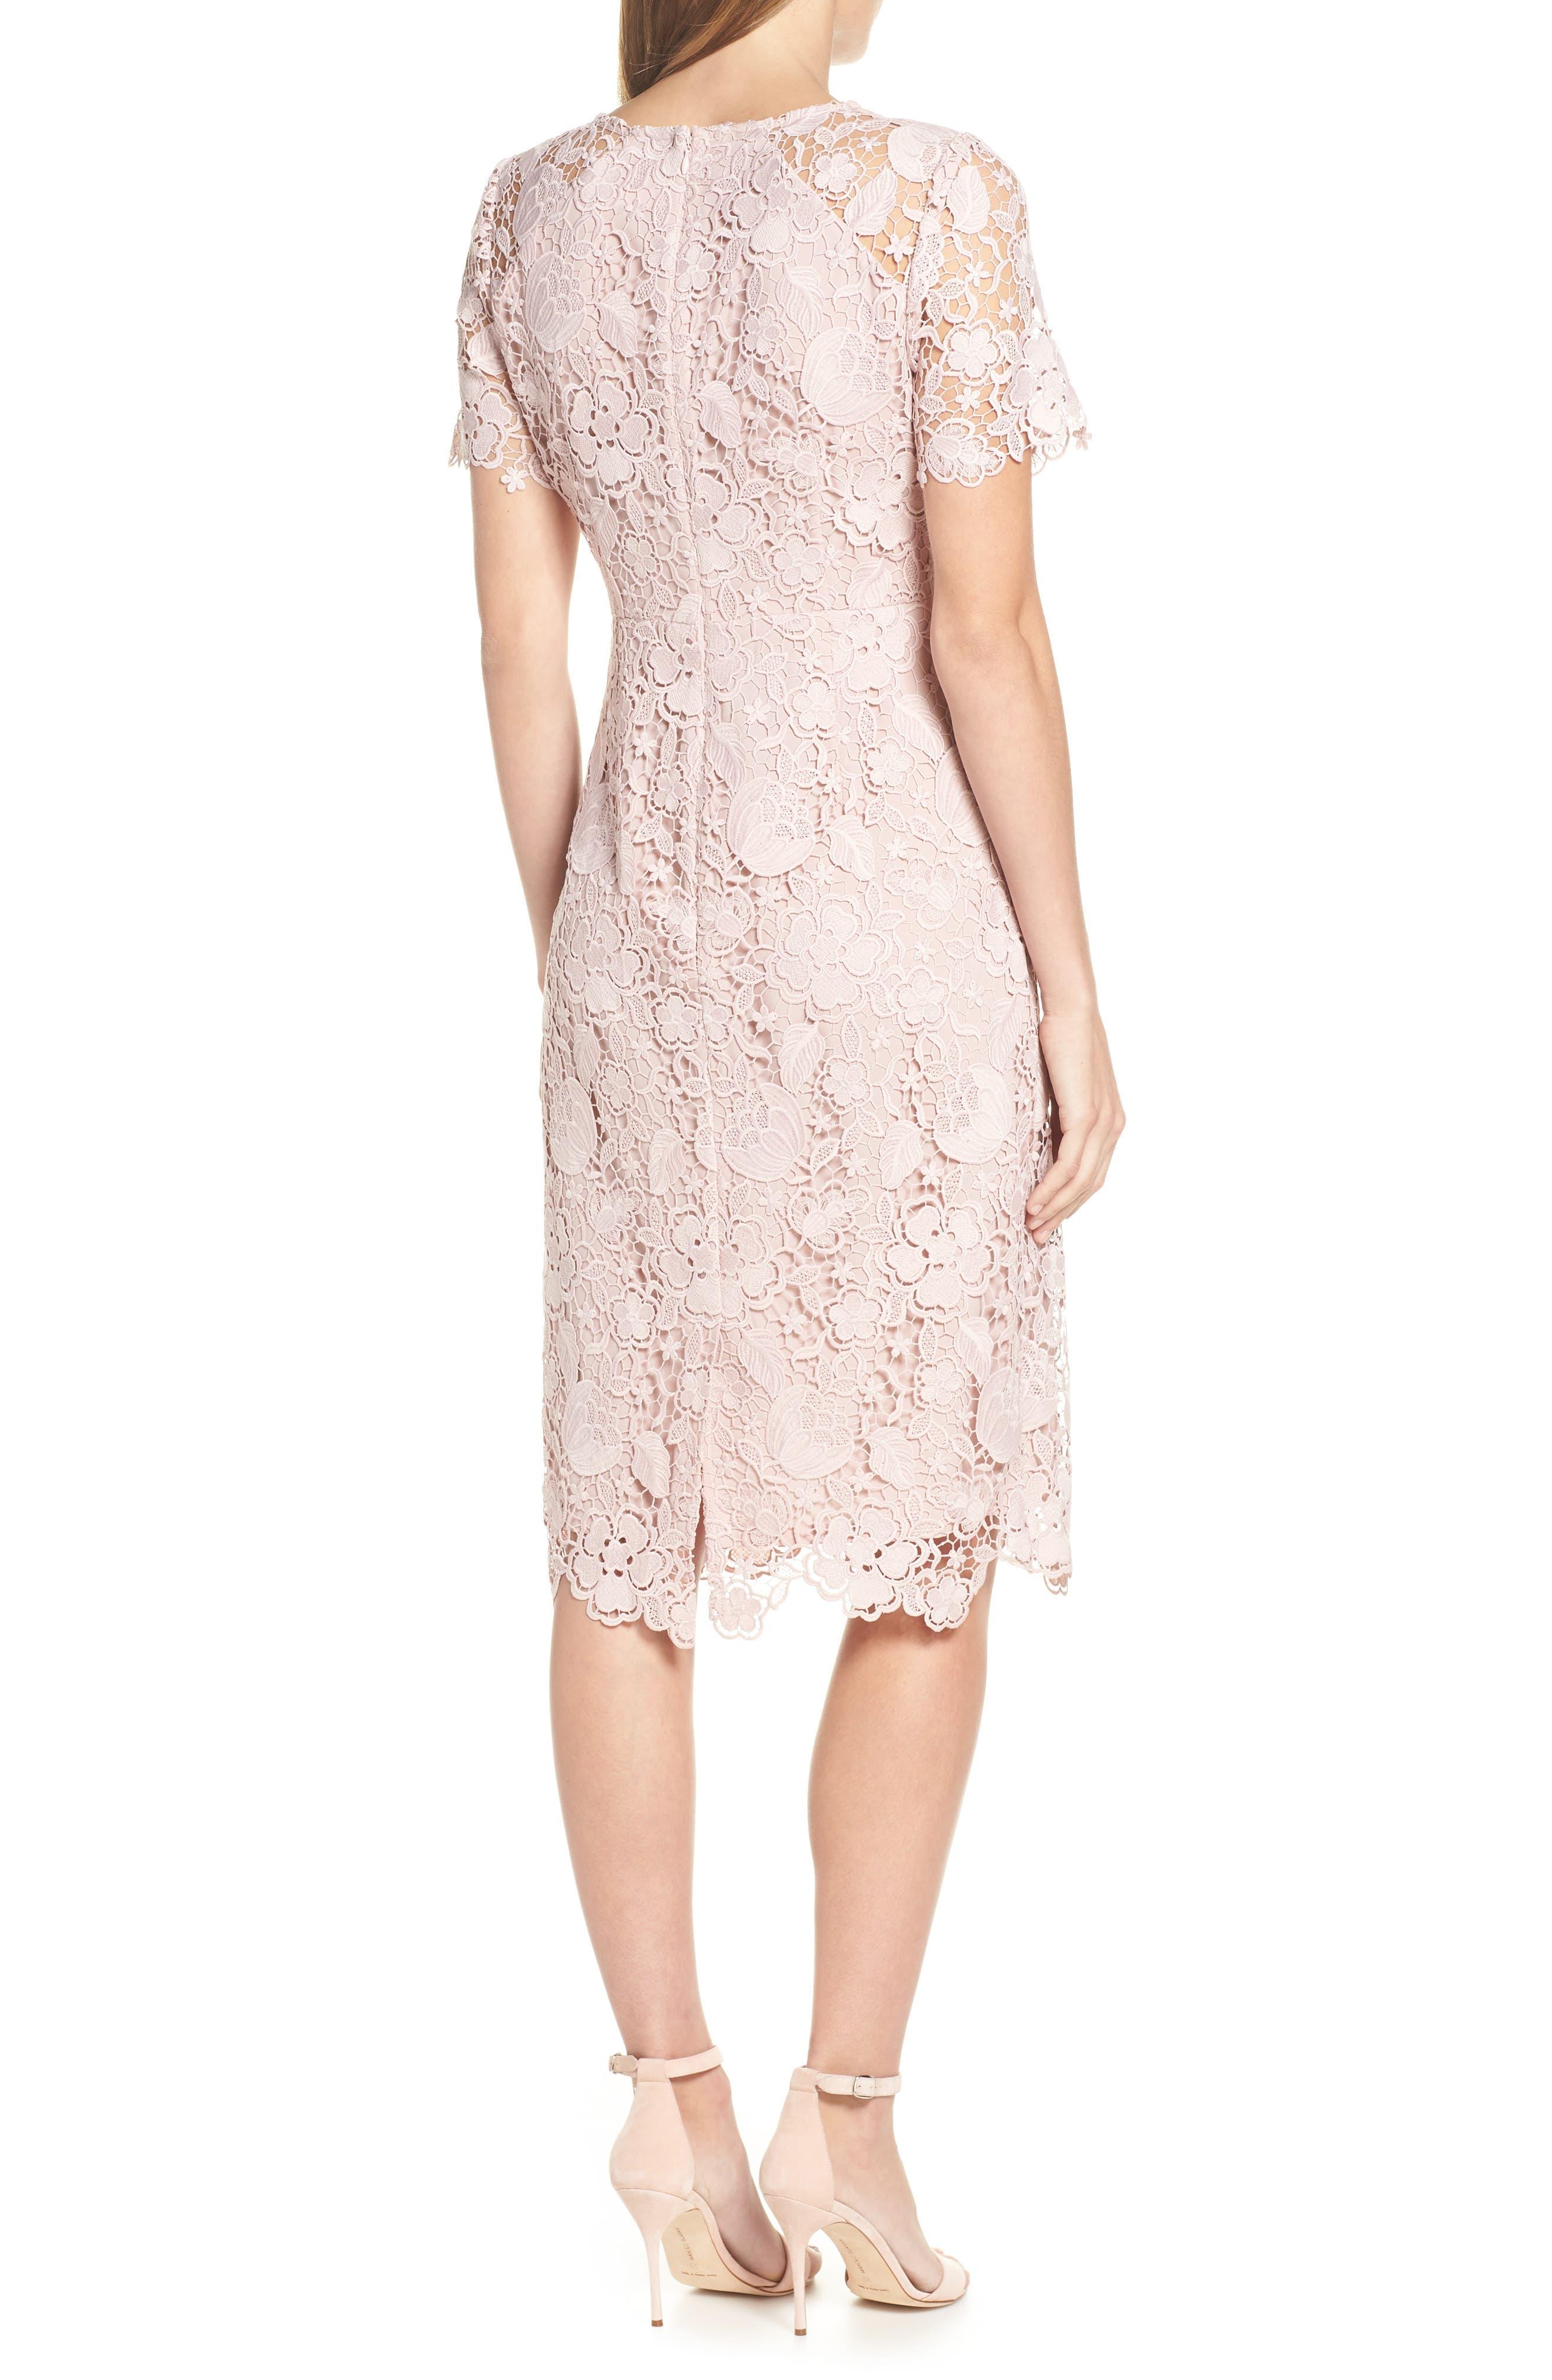 ELIZA J, Embroidered Lace Sheath Dress, Alternate thumbnail 2, color, NUDE